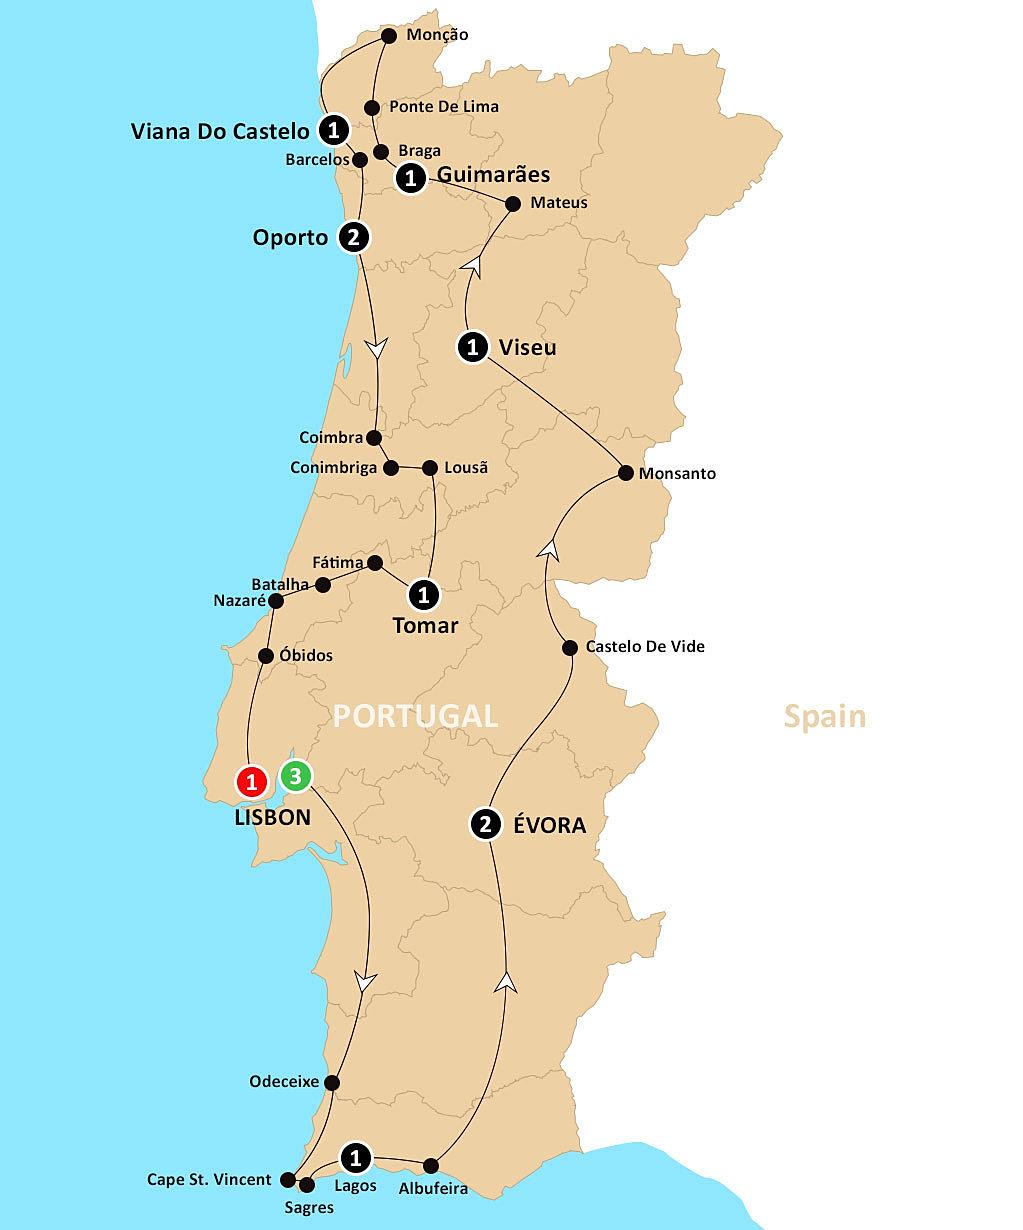 Portugal Tour - Portugal map viseu